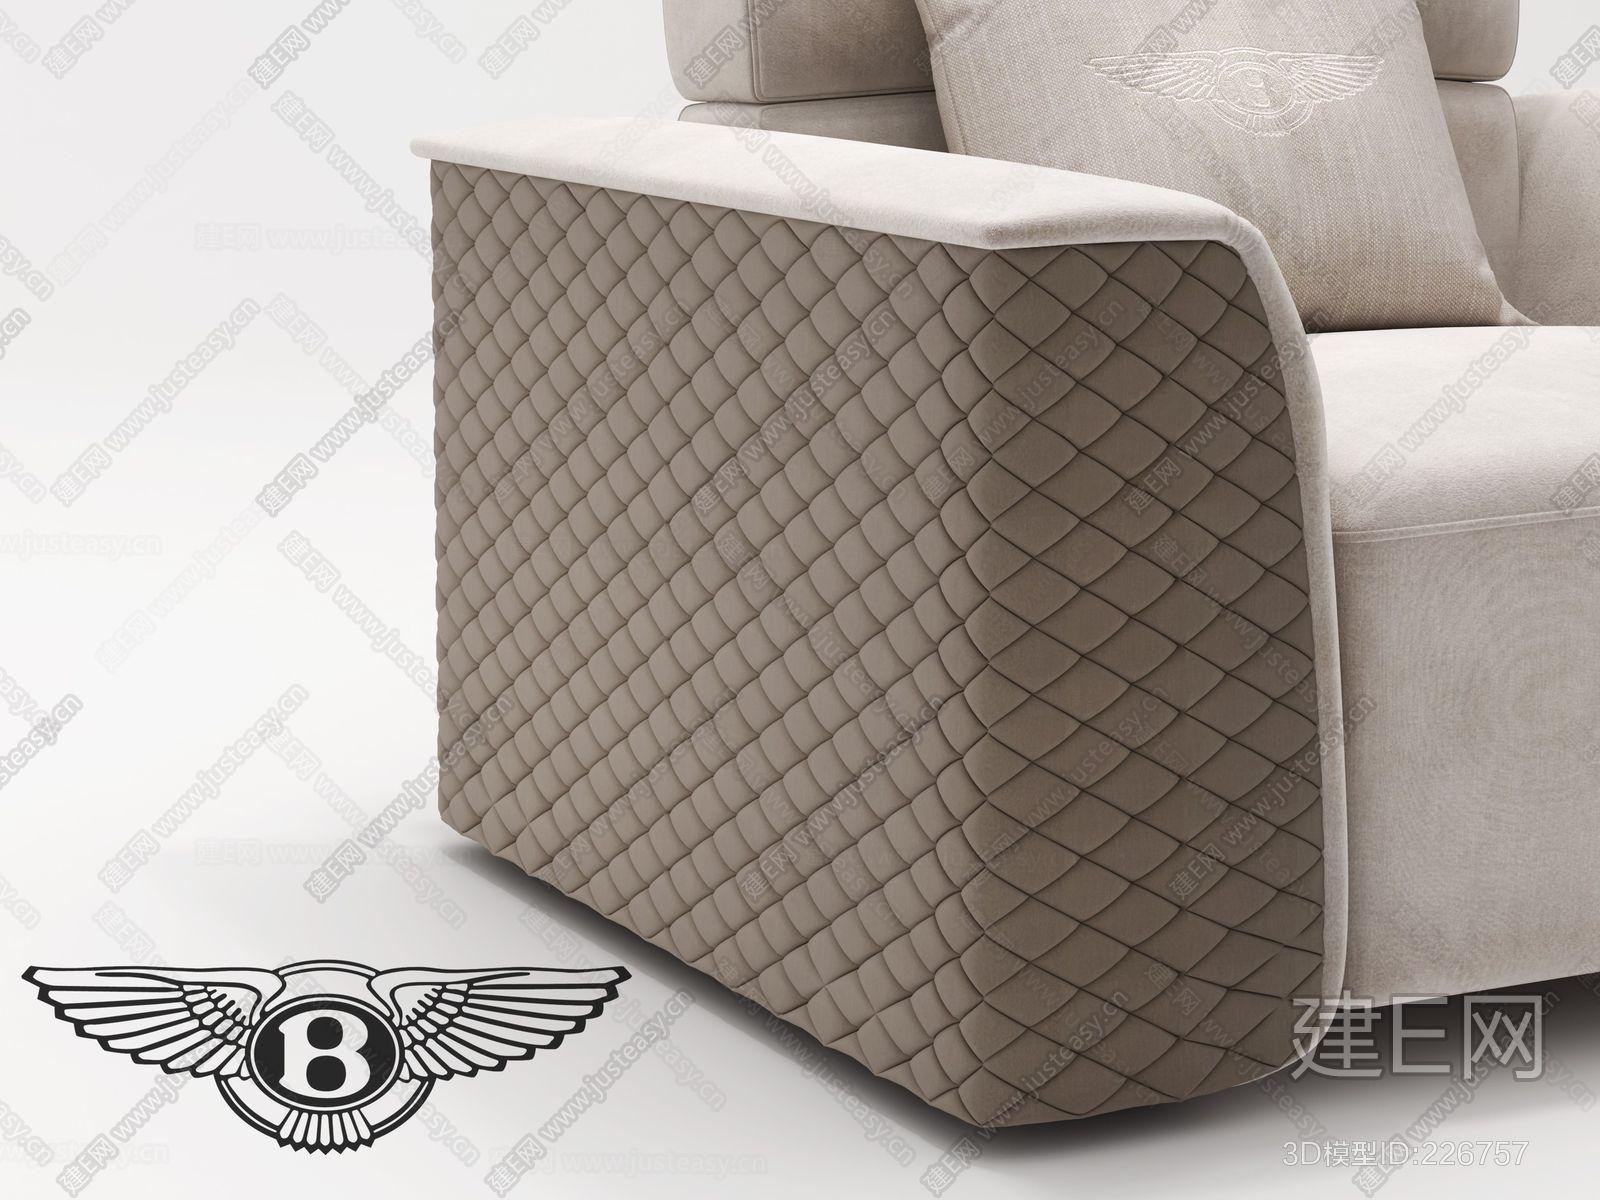 意大利宾利Bentley Home现代单人沙发ID:226757(2)